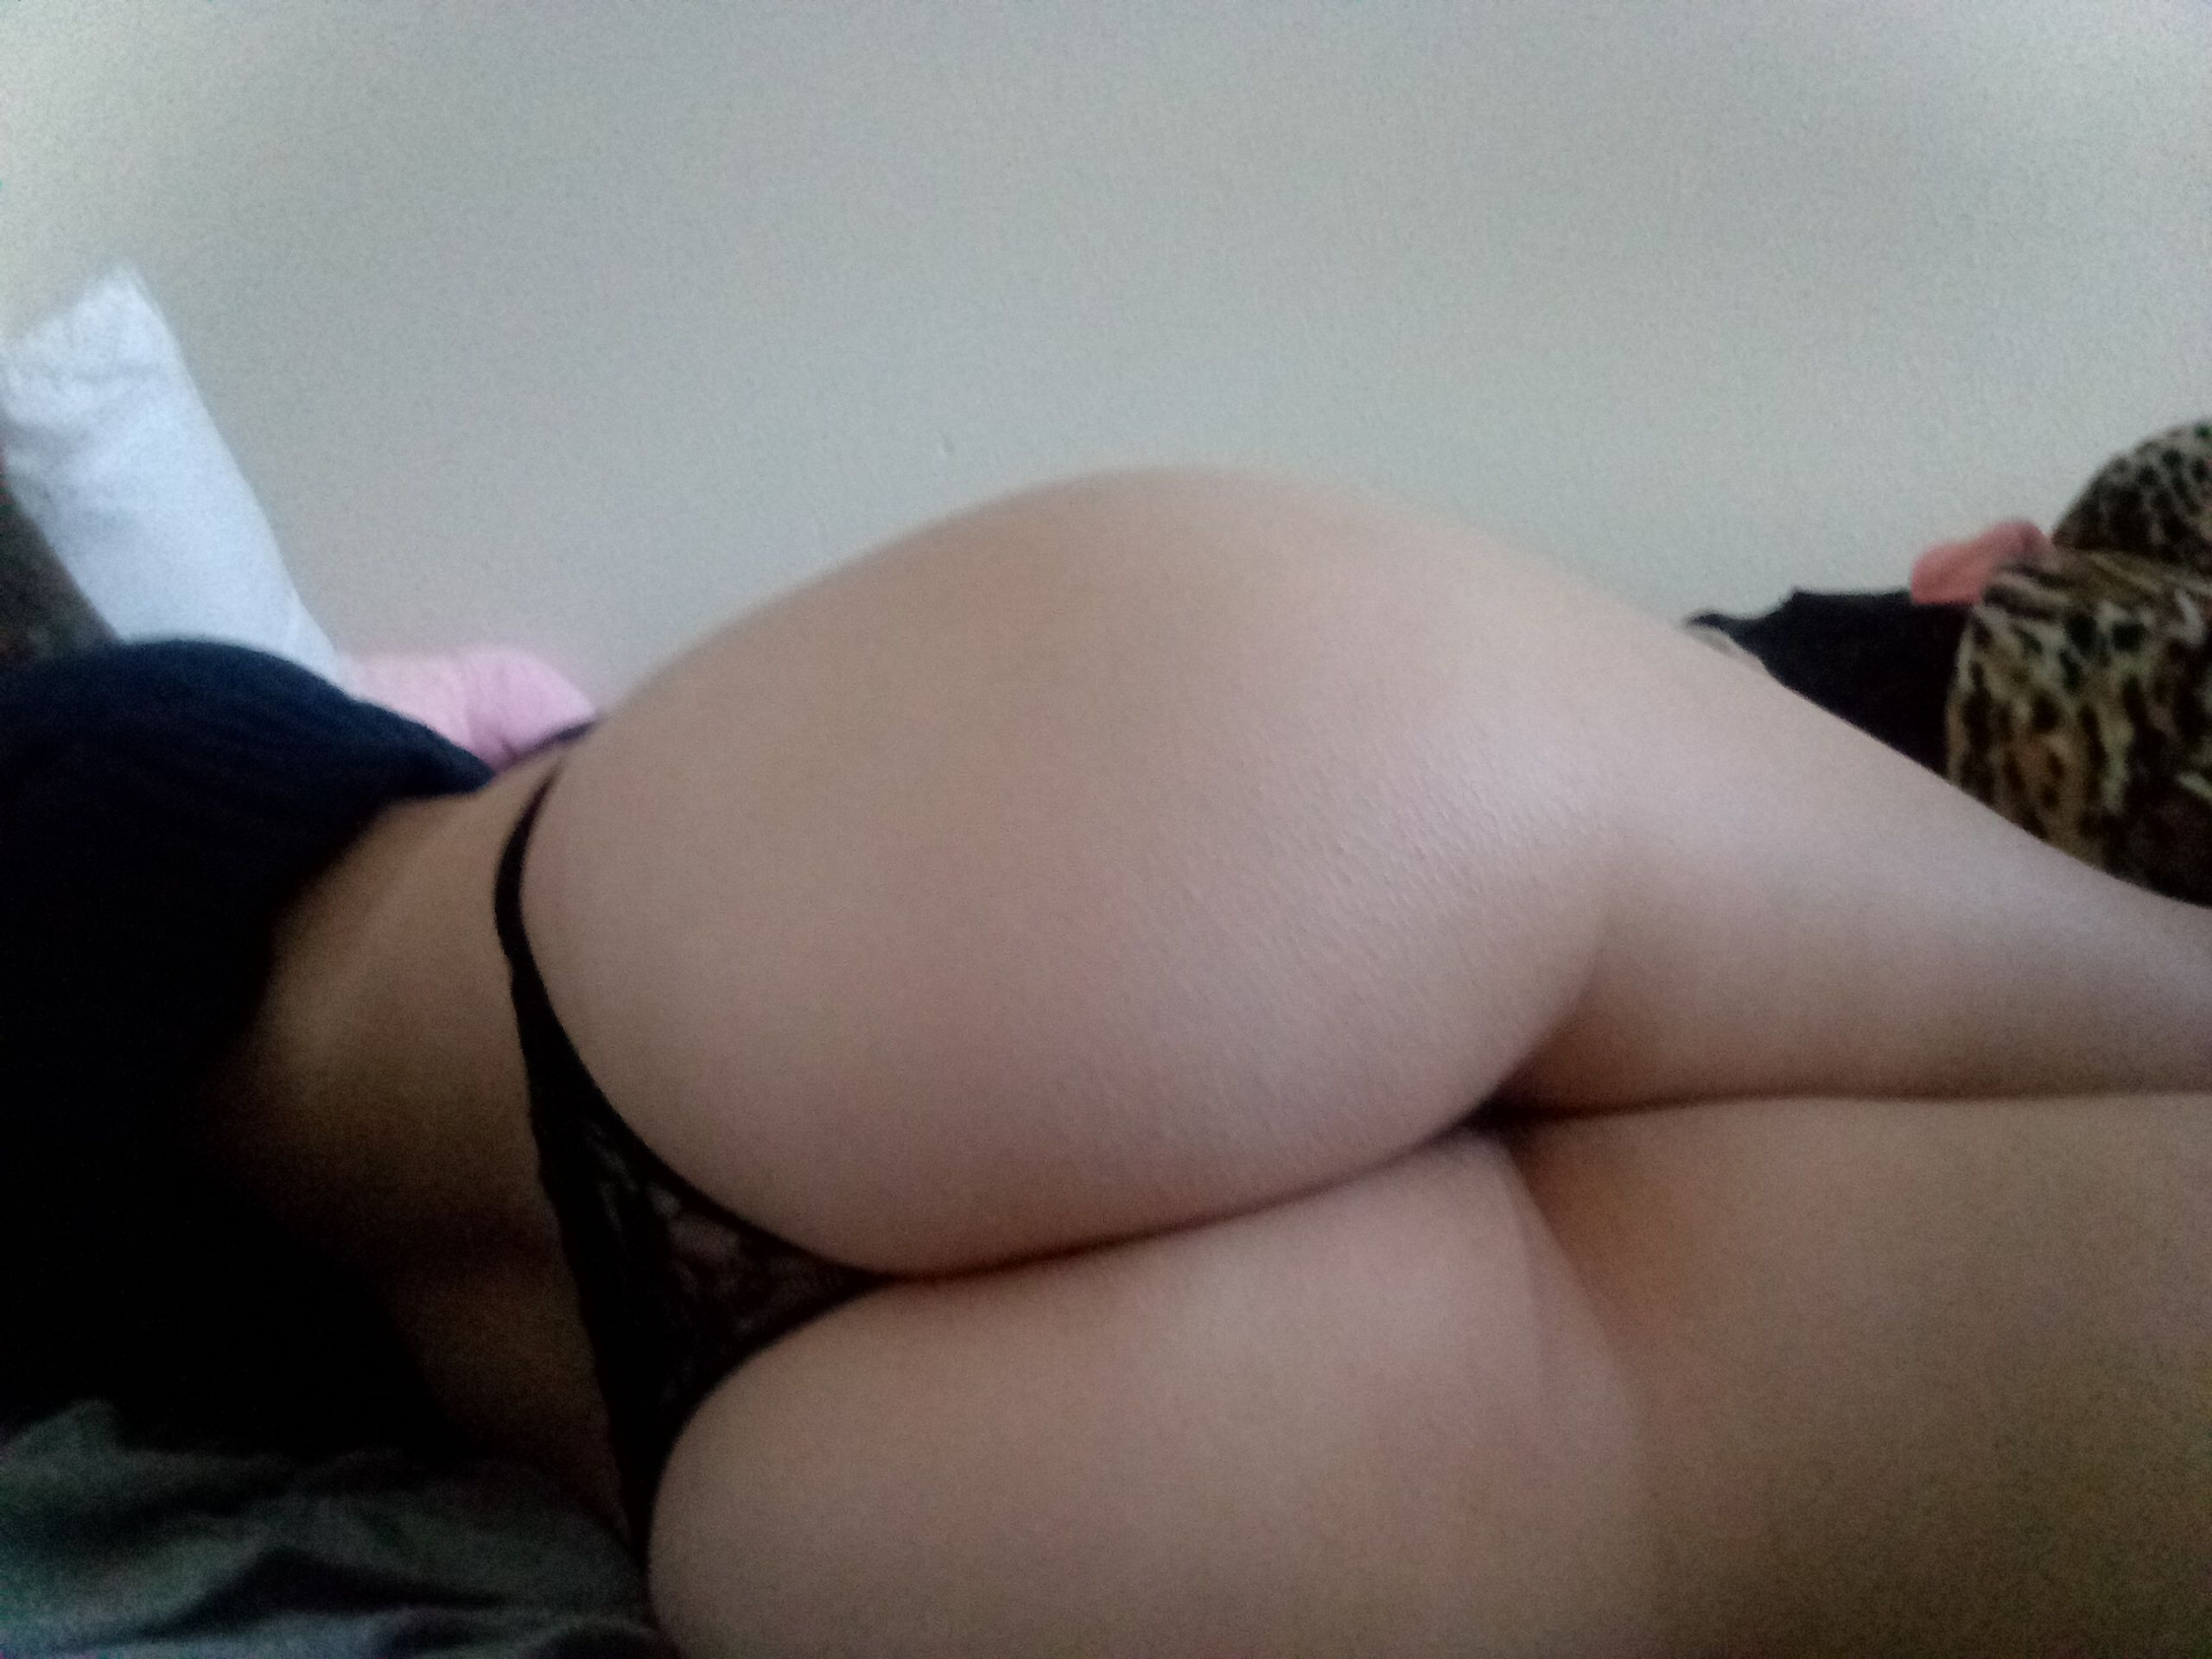 Naked girl holding naked boy bed on